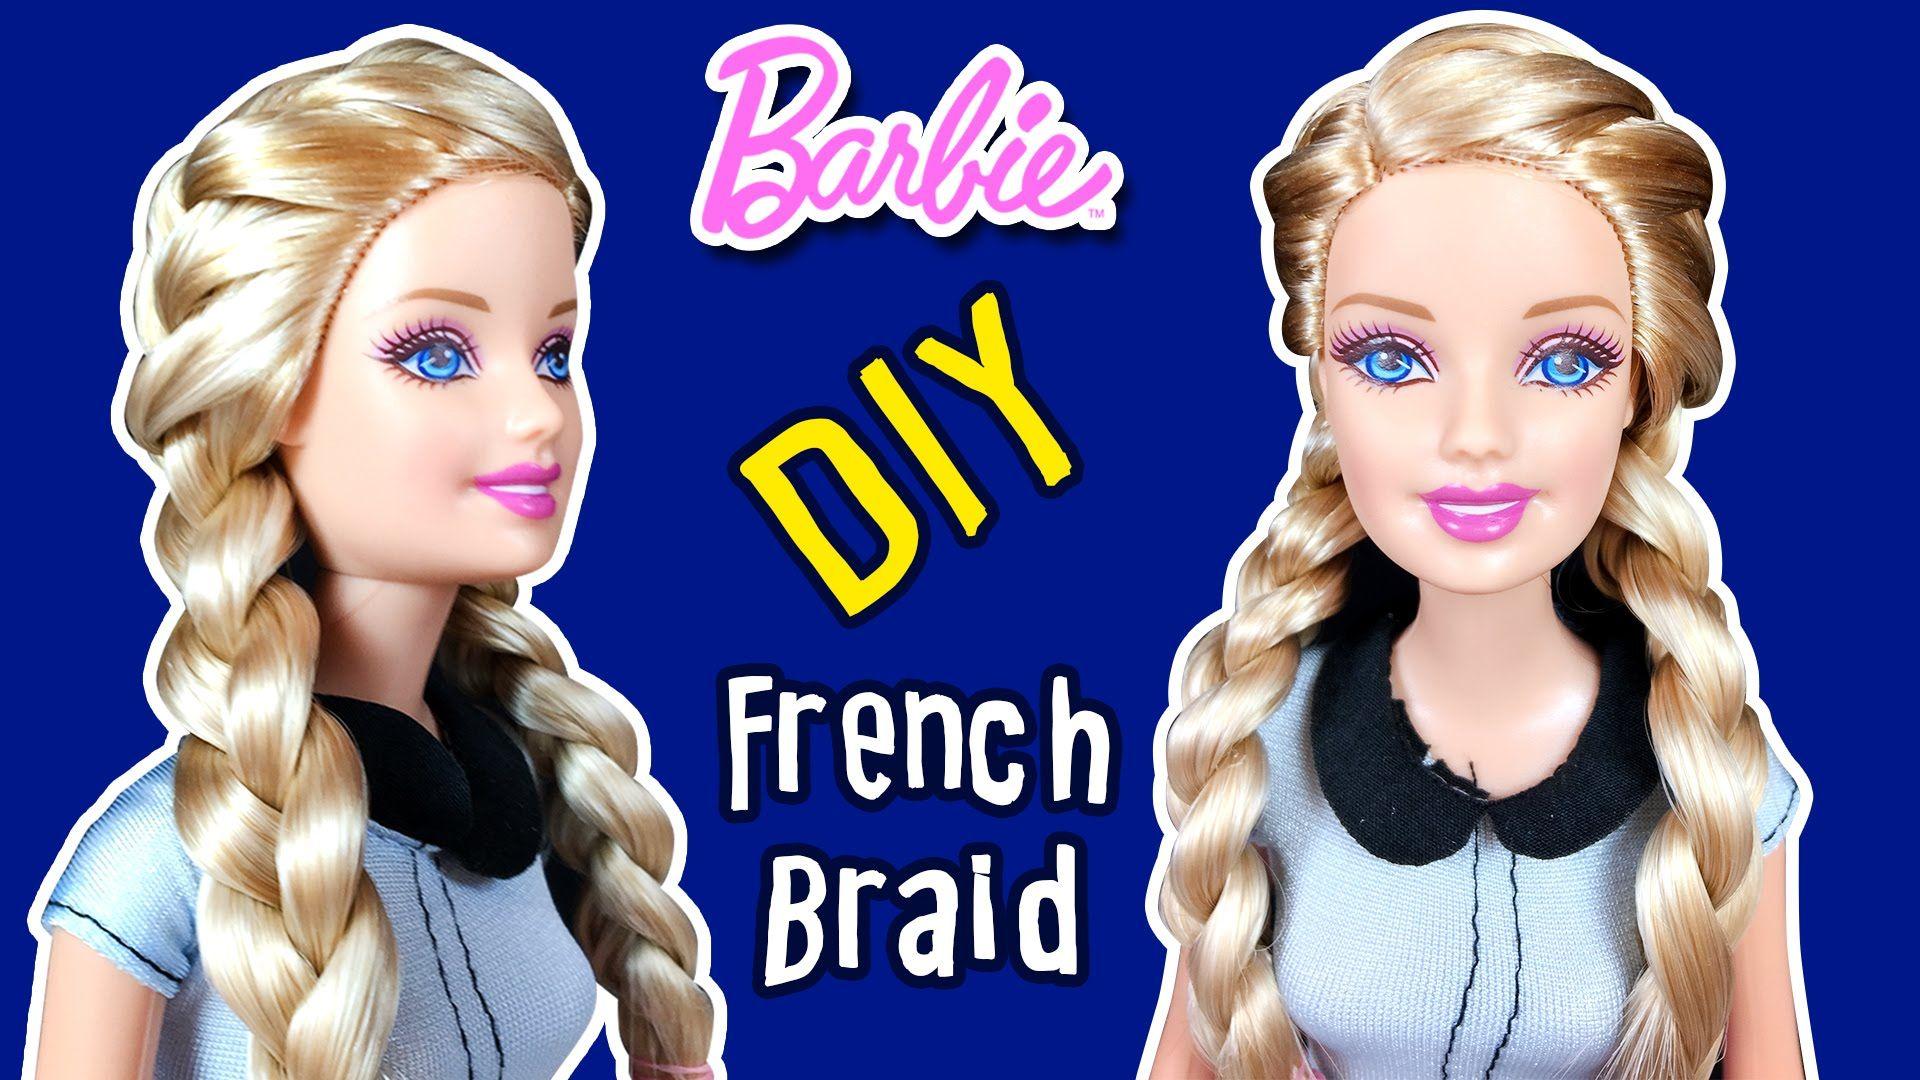 How To Braid Barbie Doll Hair Diy Double Sided French Dutch Braid Tutorial Barbie Hair Barbie Hairstyle American Girl Doll Hairstyles